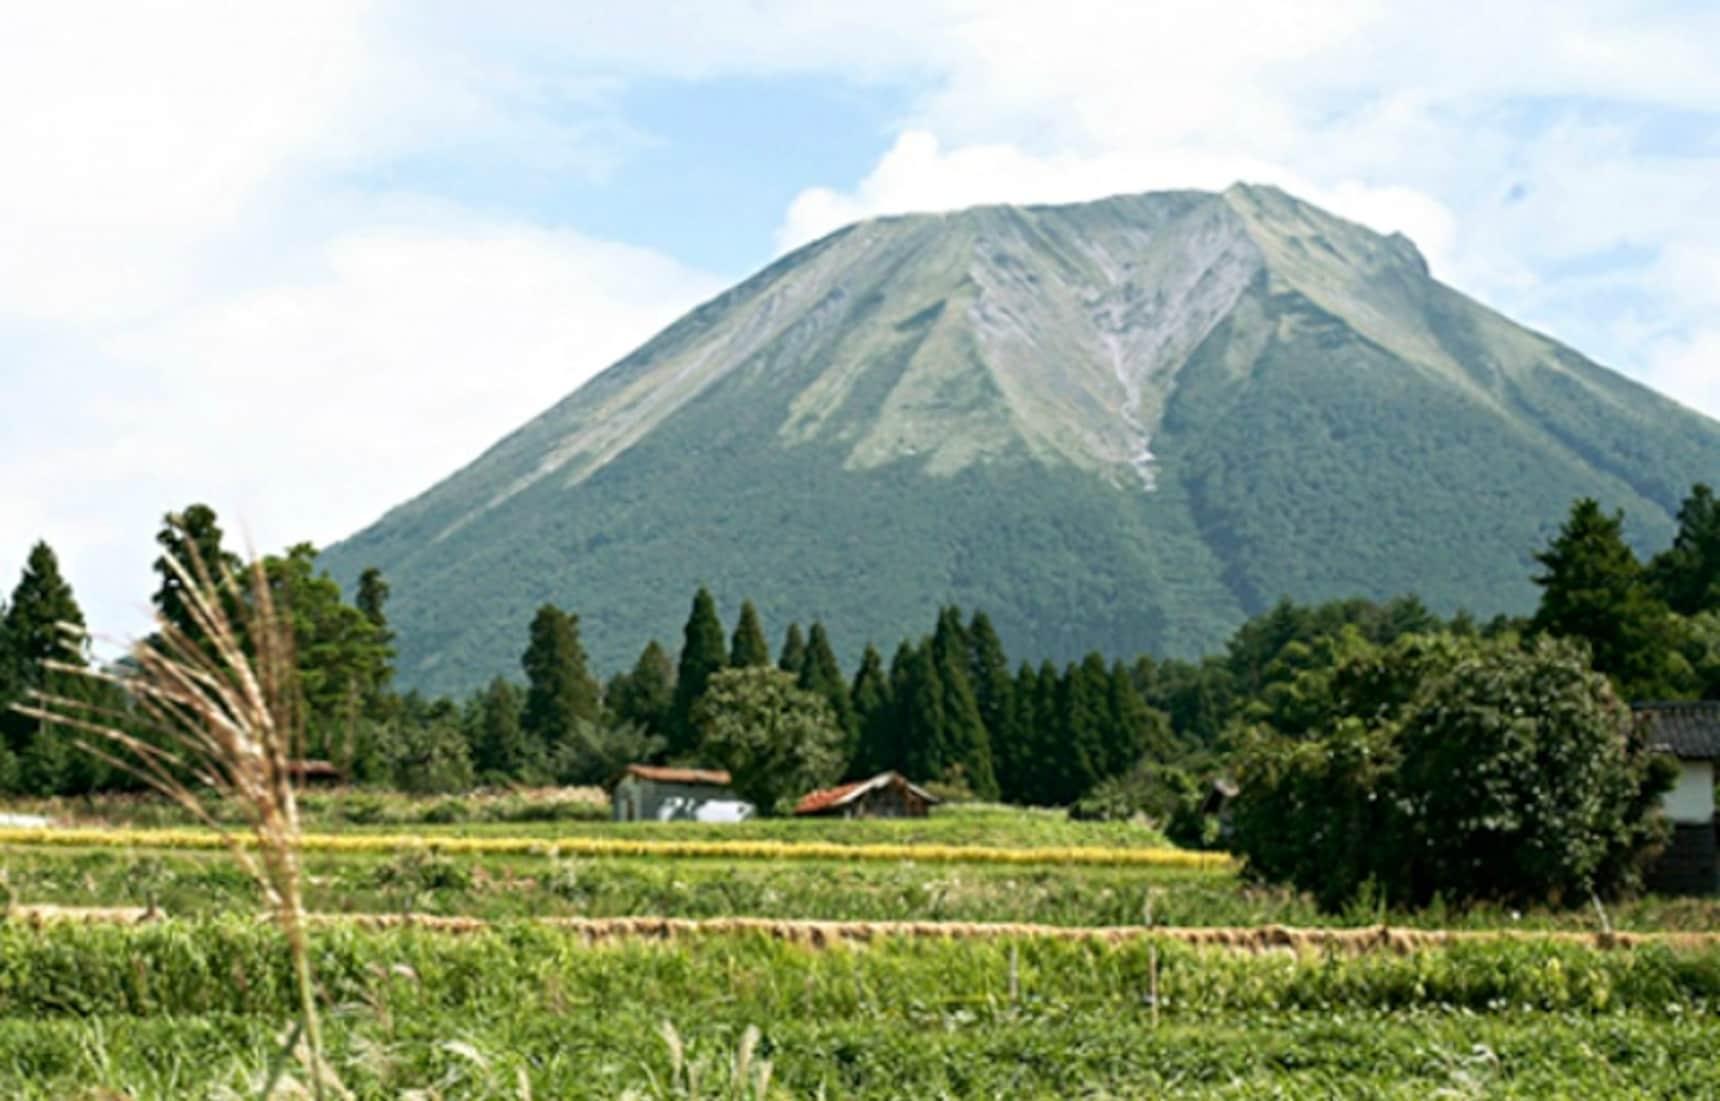 Ride With the Gods in Tottori Prefecture